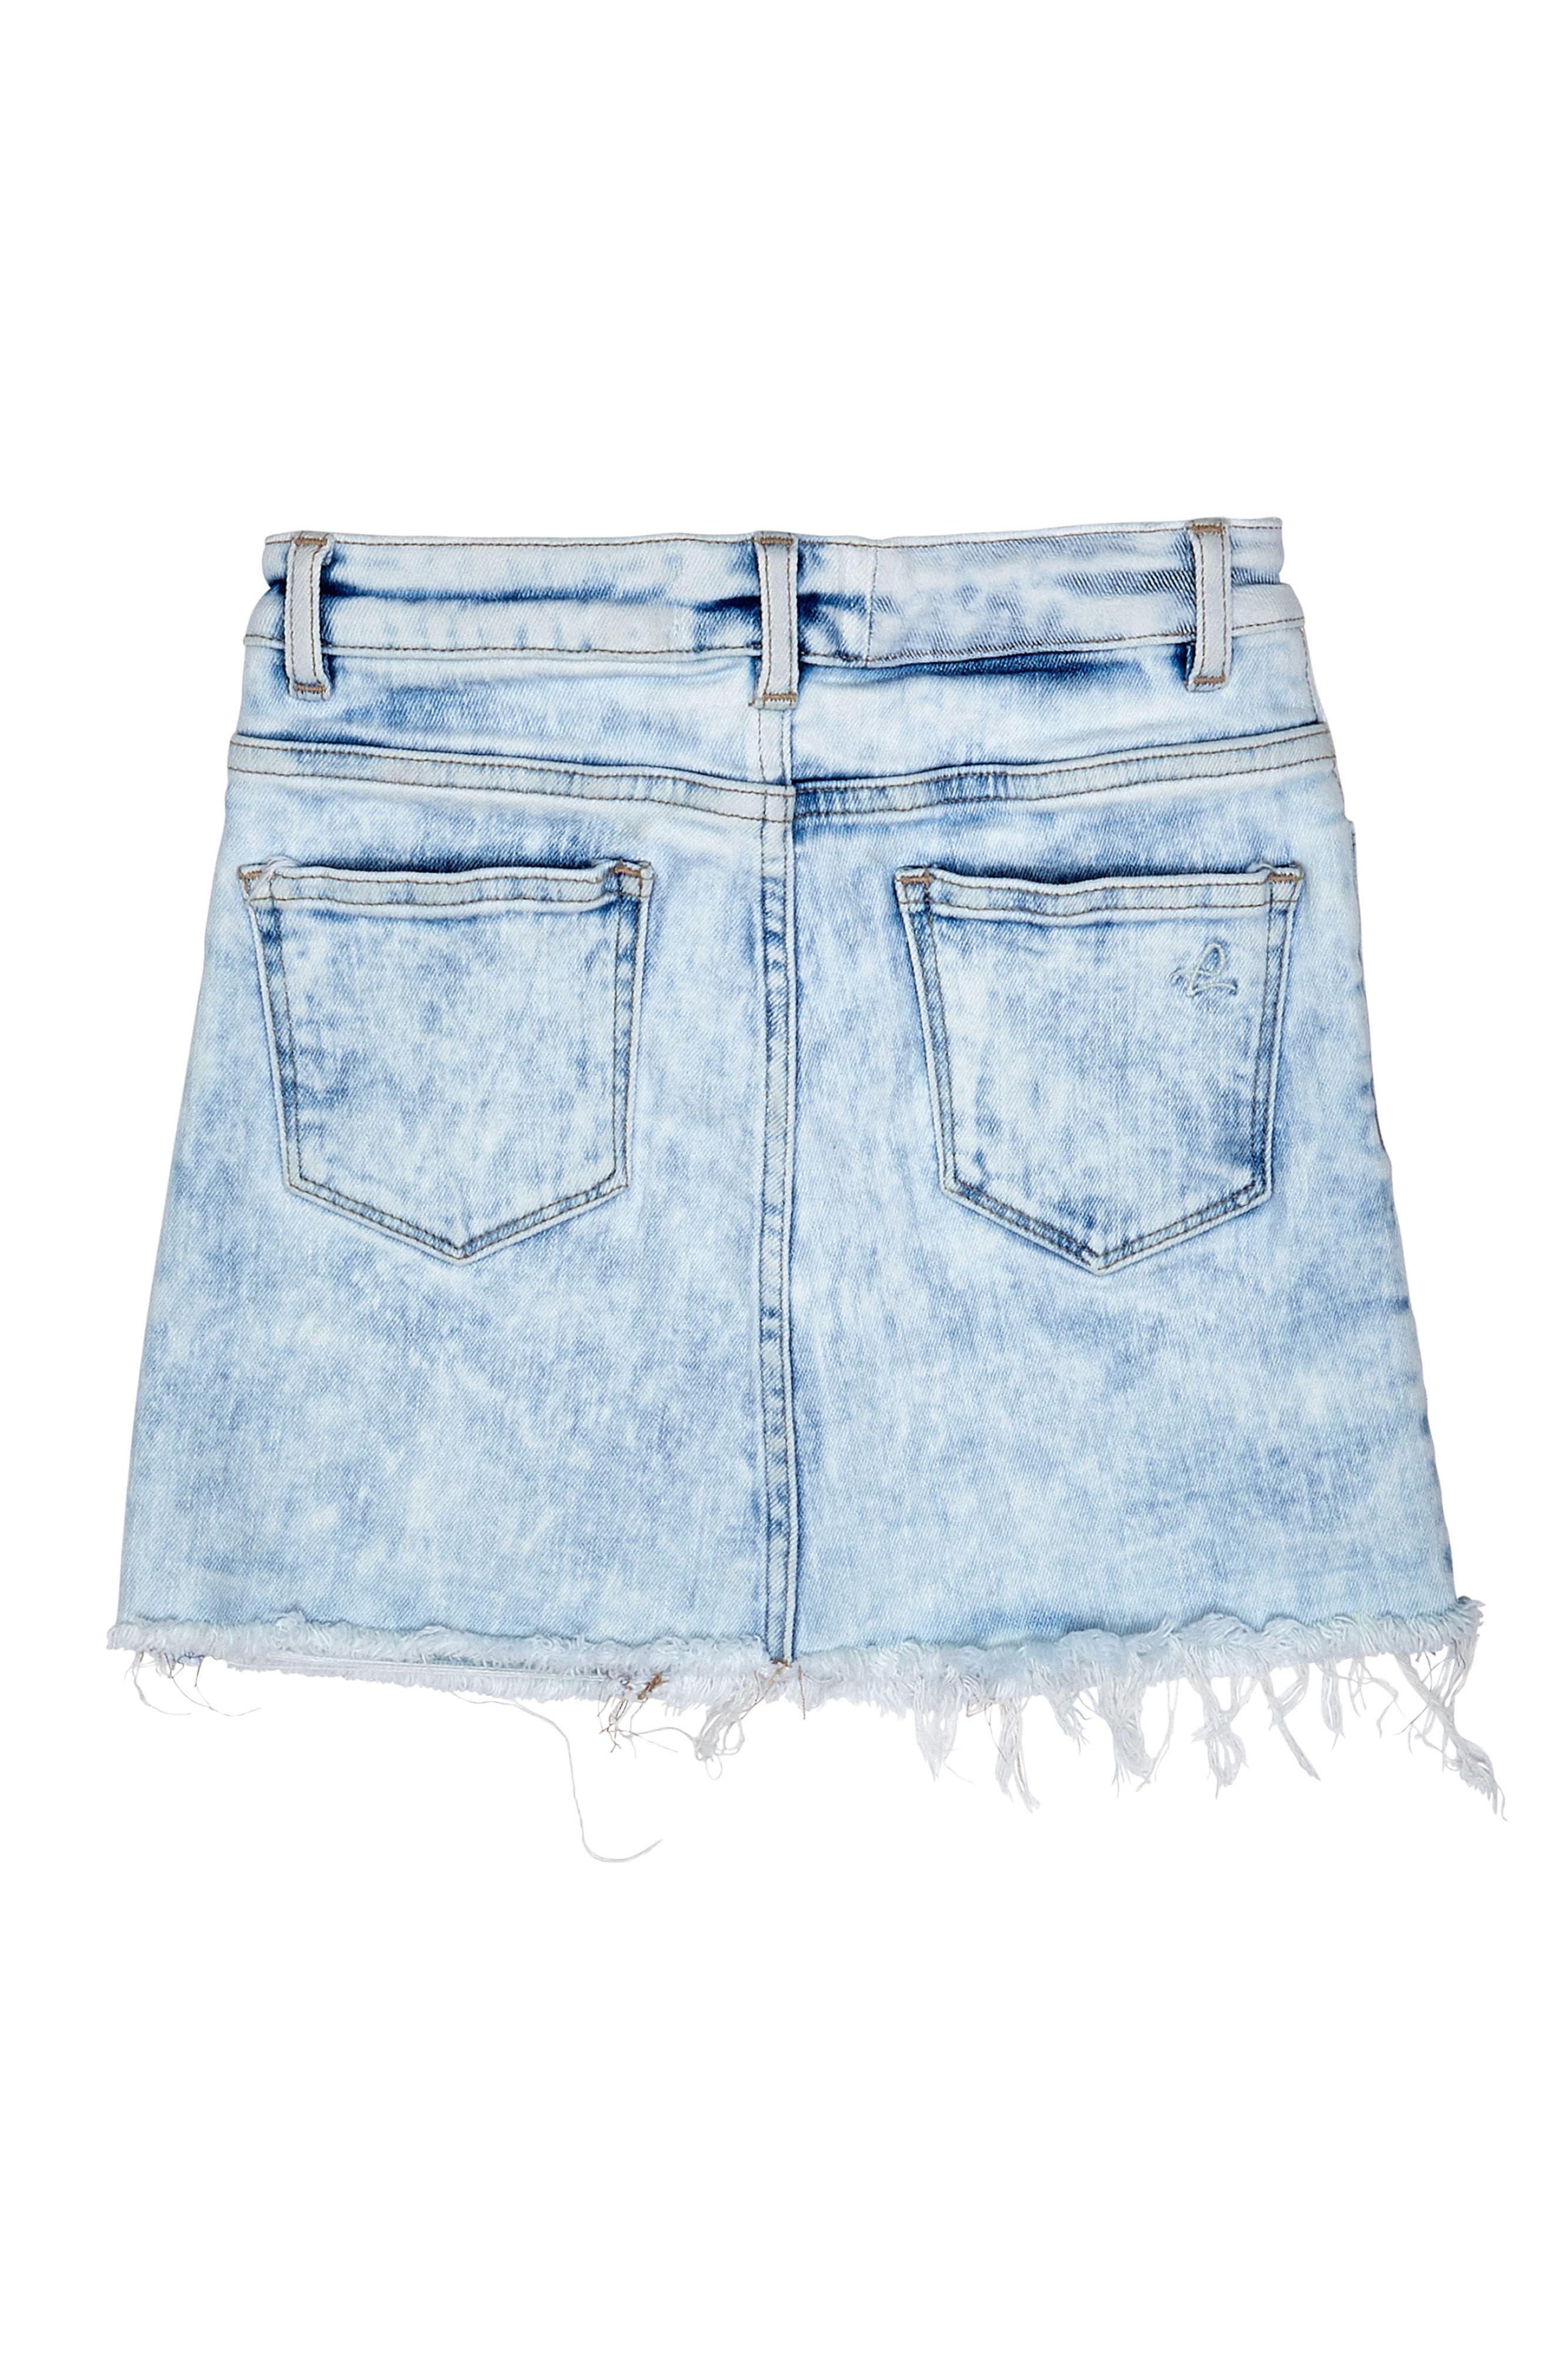 Cutoff Denim Skirt,                             Alternate thumbnail 2, color,                             430